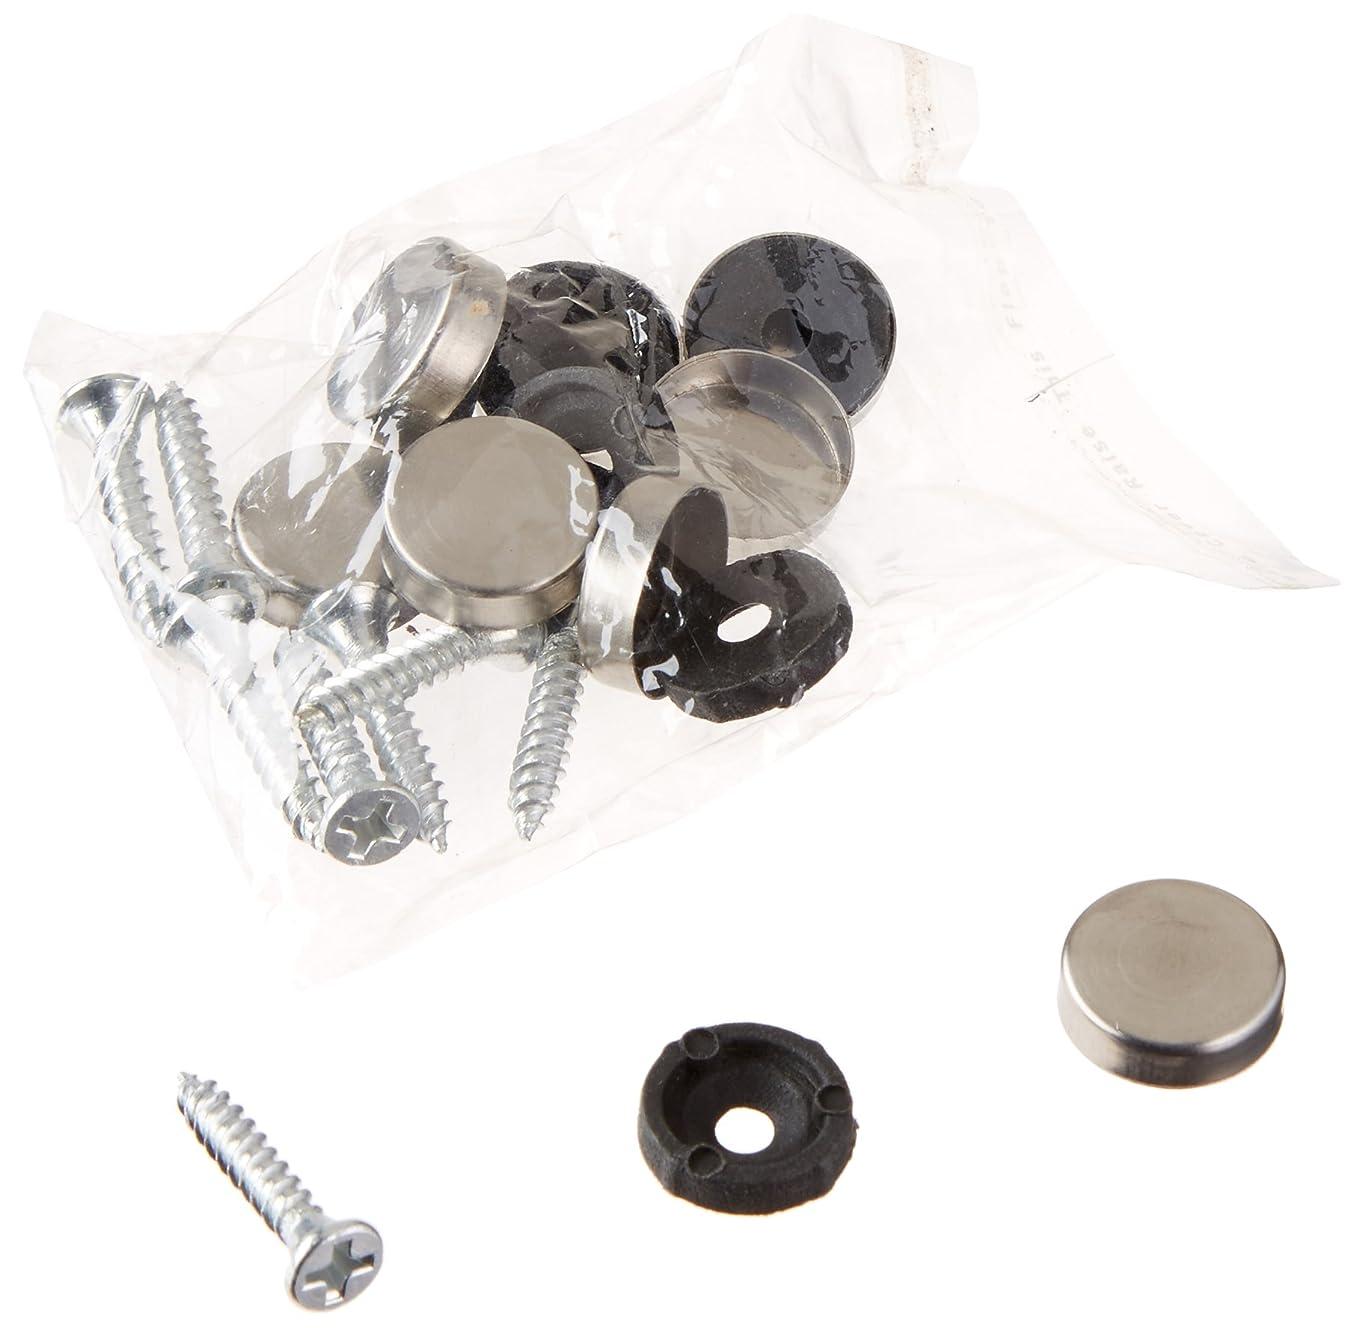 8 Pcs 14mm Dia Stainless Steel Decorative Mirror Screw Cap Nails